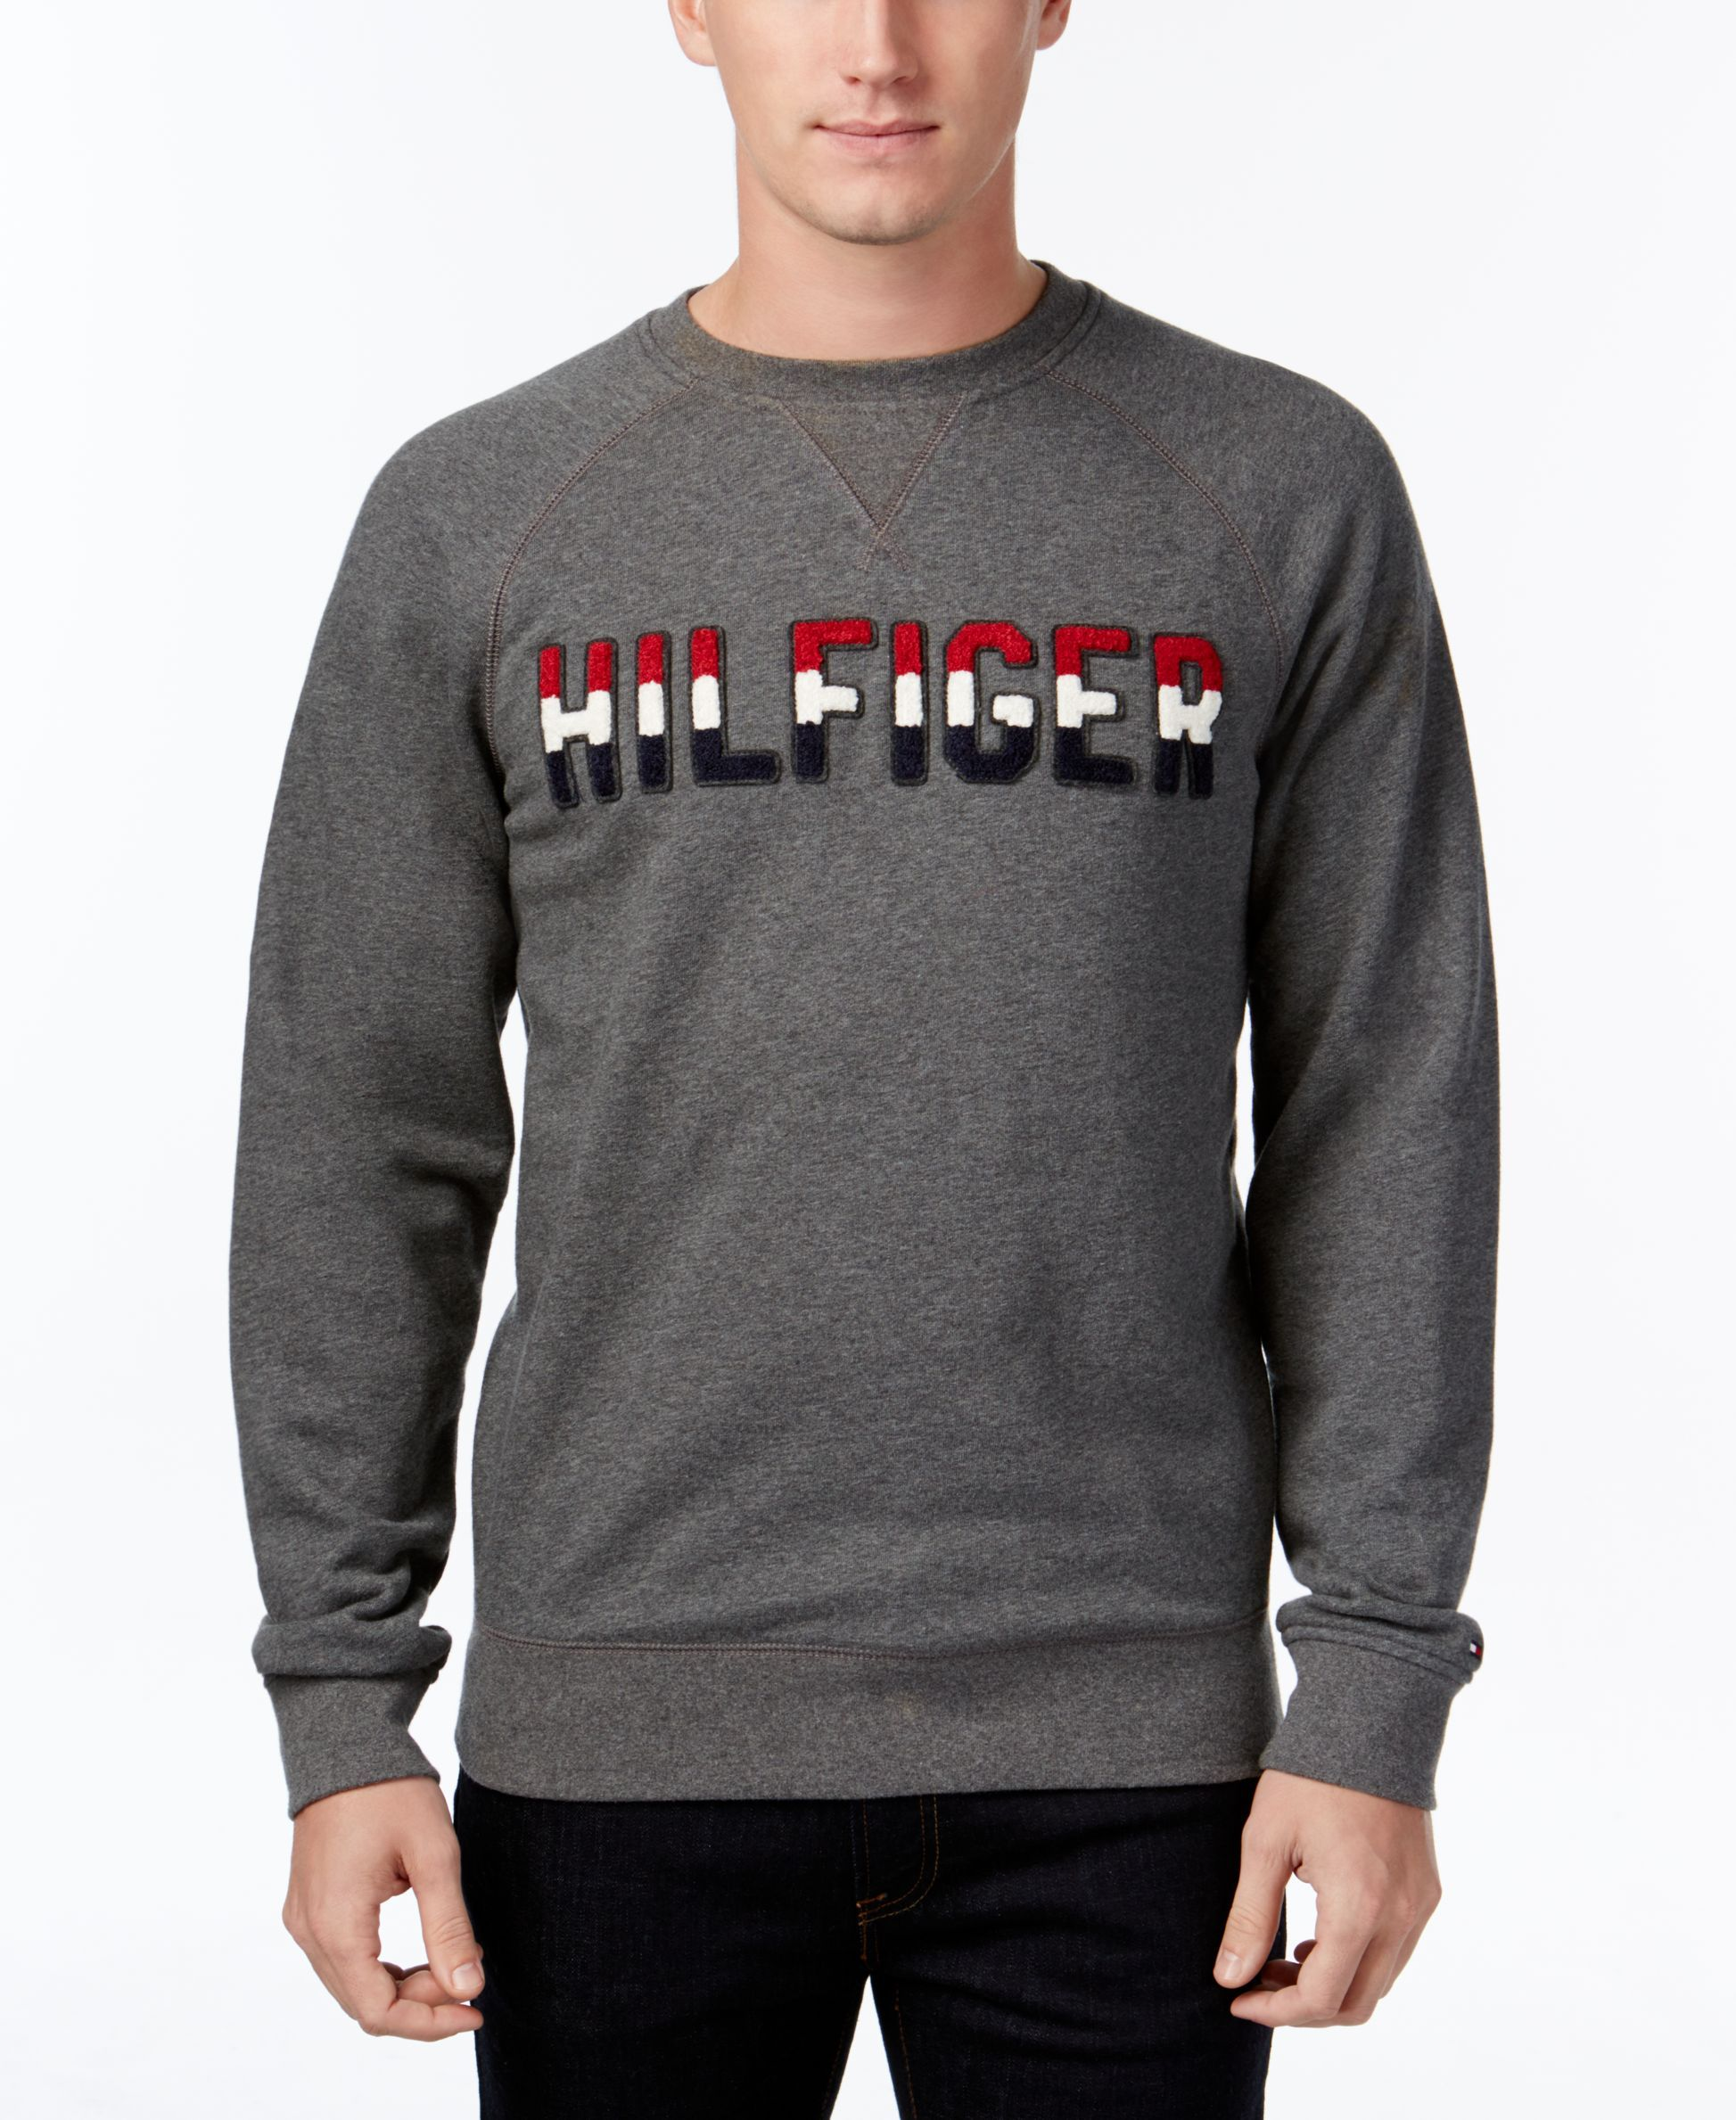 0e22424f8e957 Tommy Hilfiger Arrowhead Logo T-Shirt